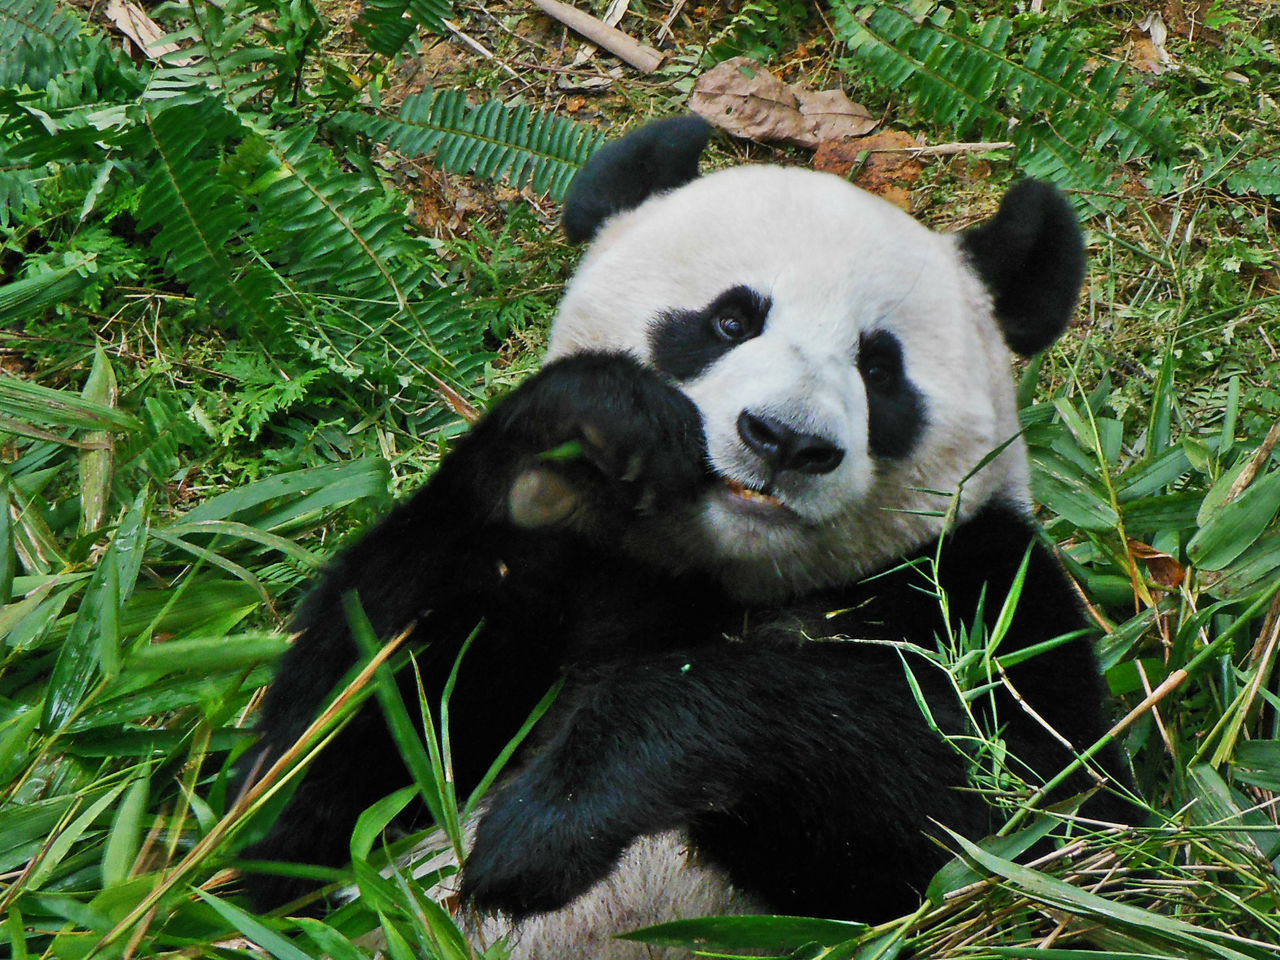 Animal Themes Animal Wildlife Animals In The Wild Bamboo Giant Panda Hungry Indulge Mammal One Animal Panda - Animal Photogenic Panda Portrait Singapore Zoological Garden